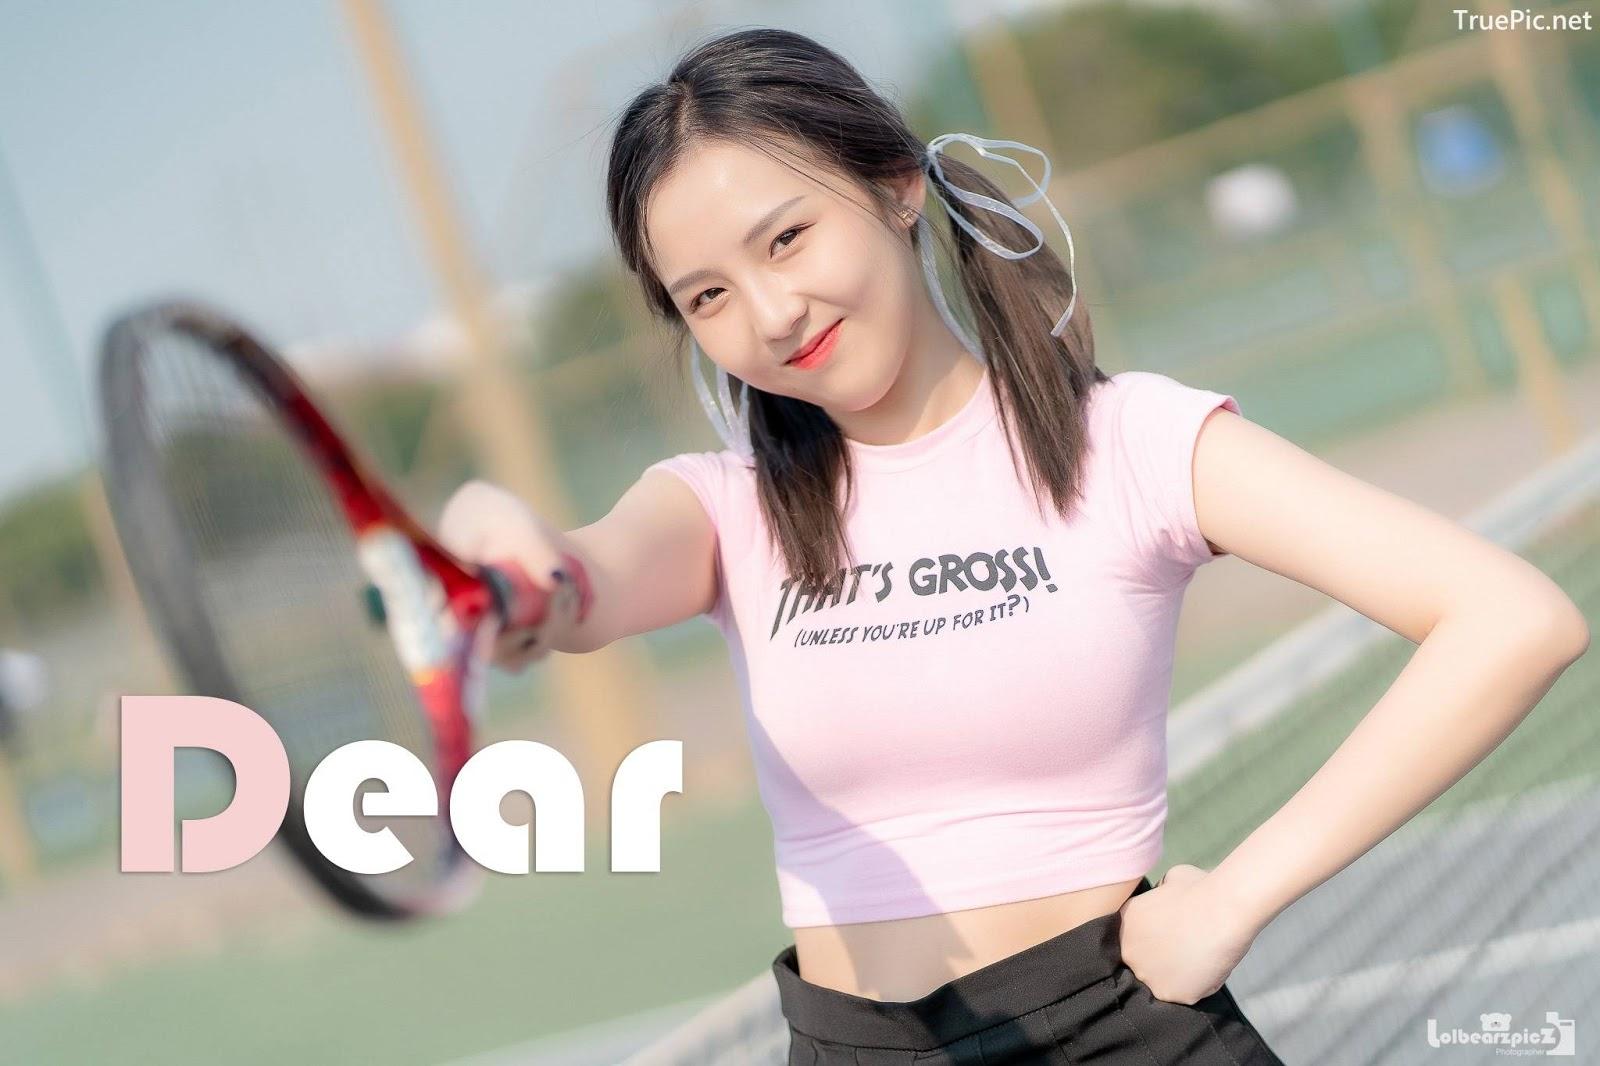 Image Thailand Model - Pattanan Truengjitrarat - Cute Sports Girl - TruePic.net - Picture-1